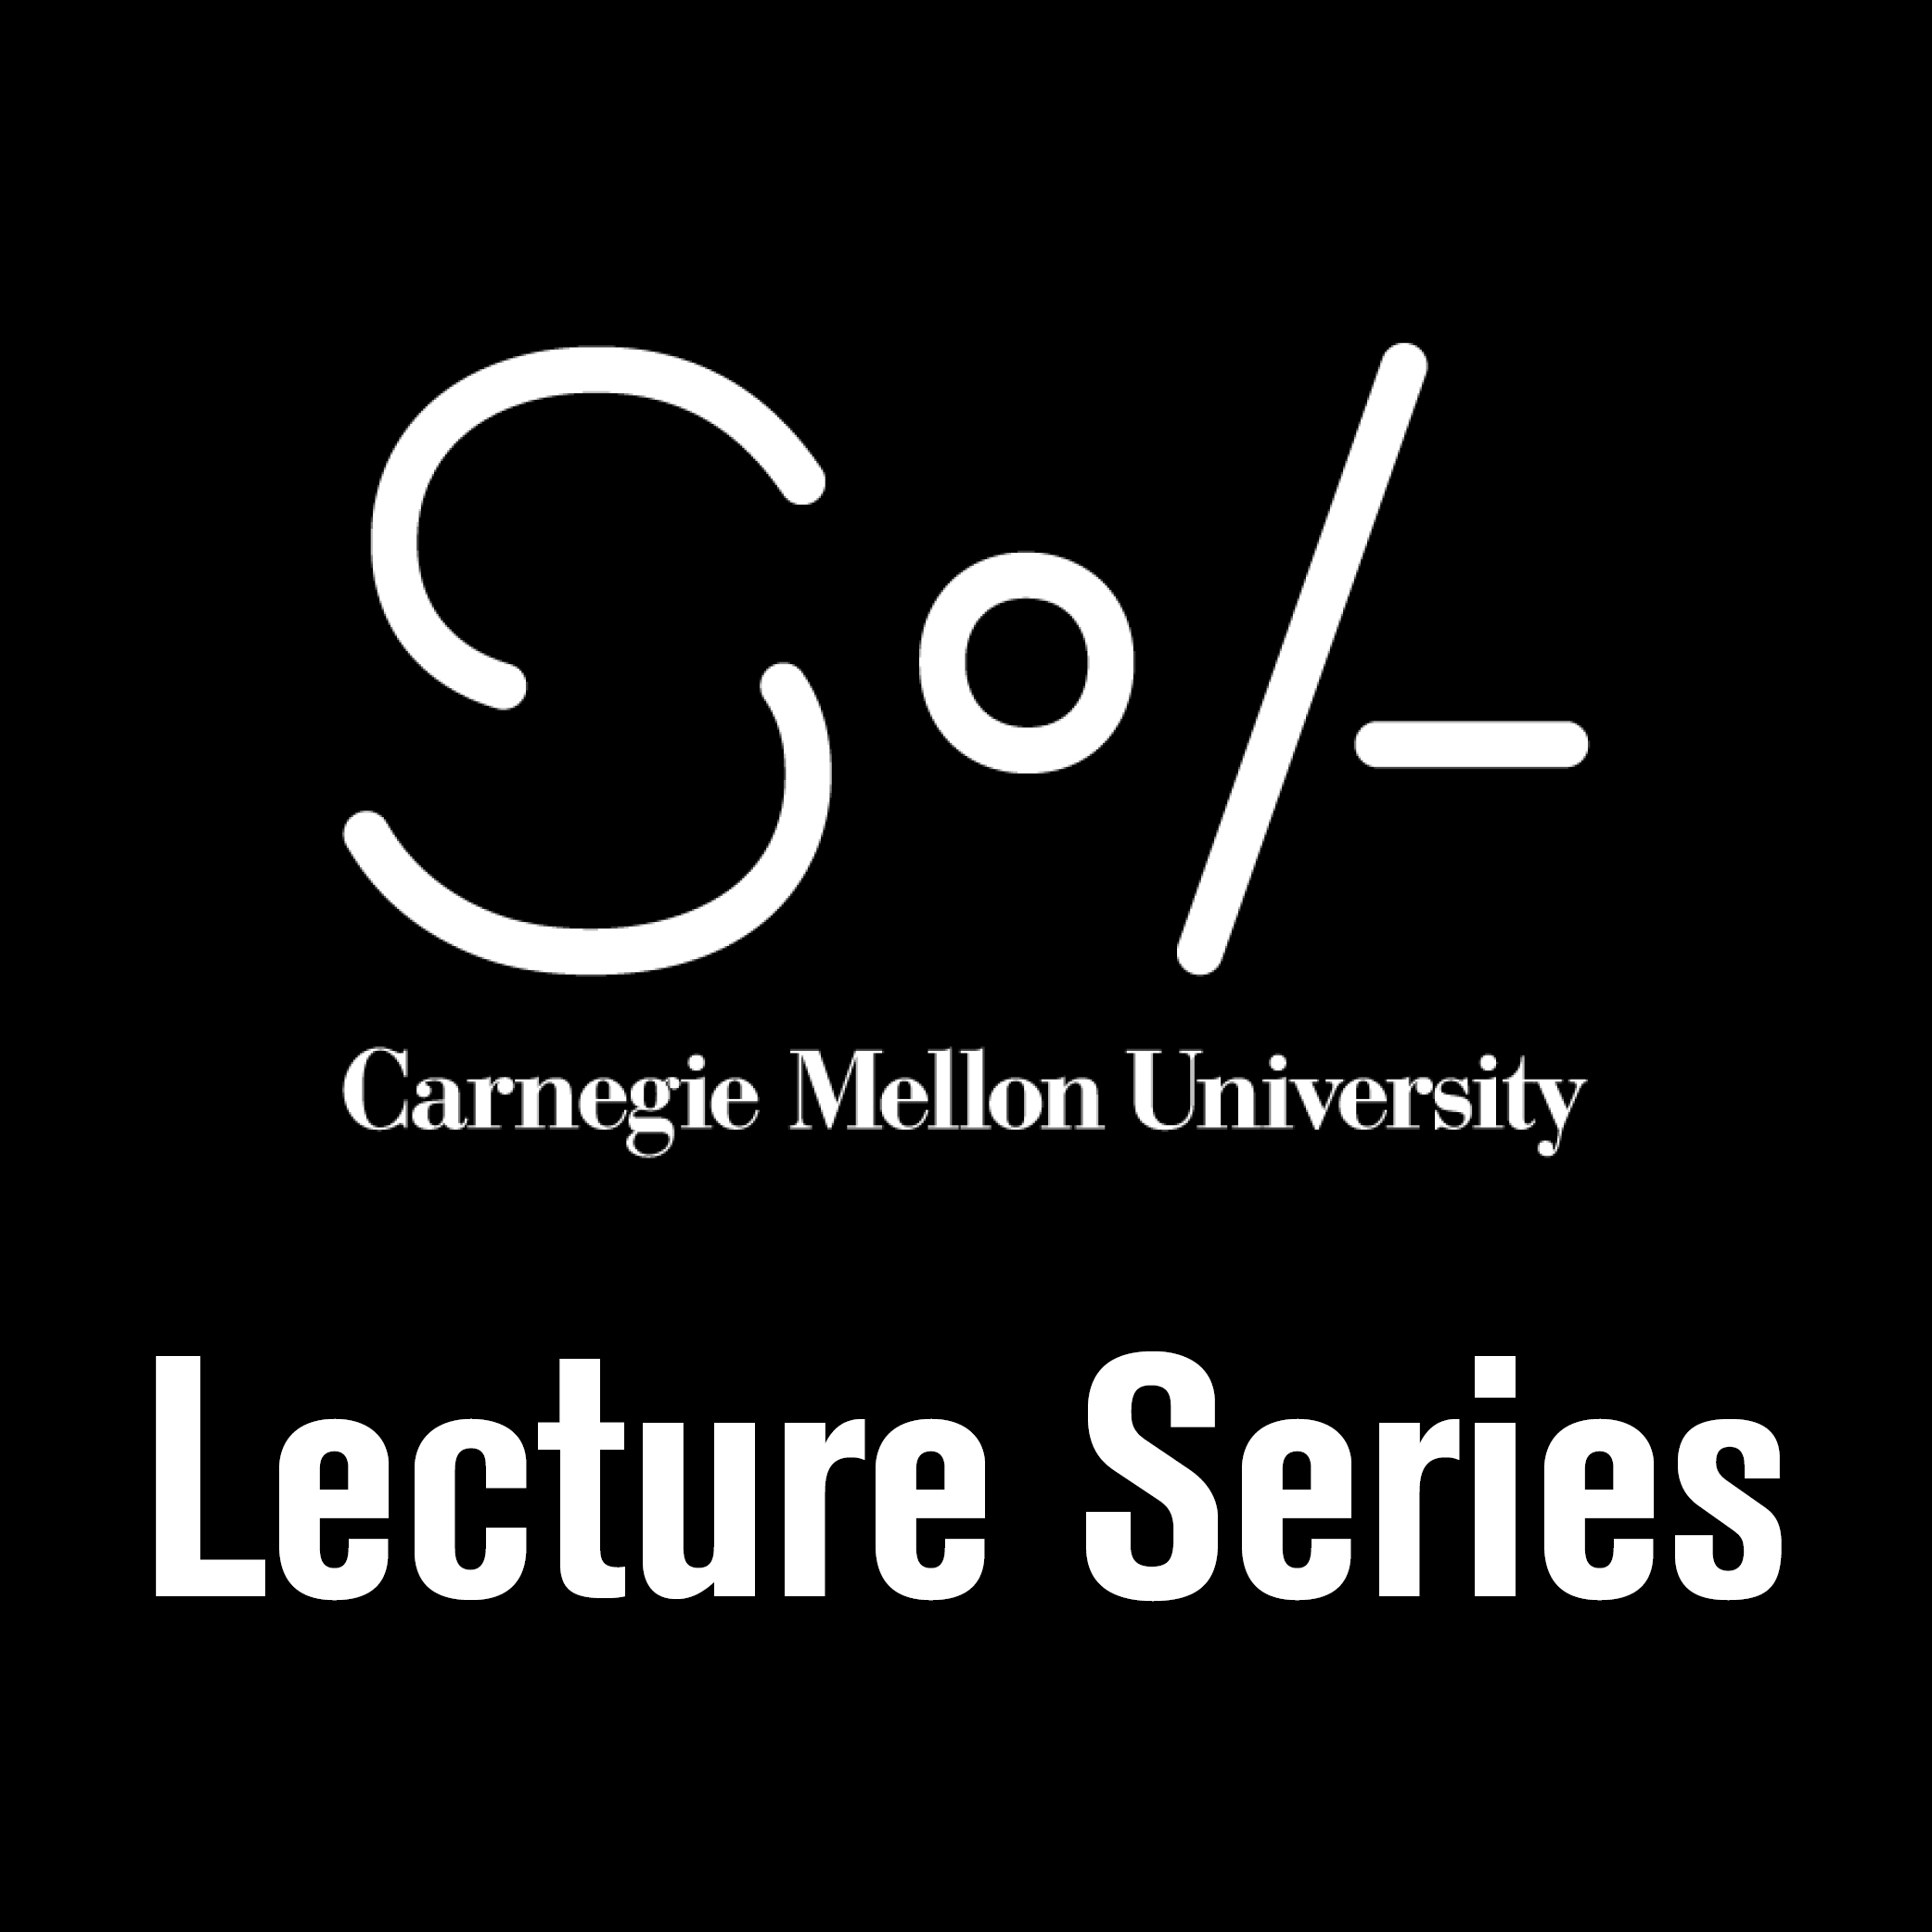 Lecture Series logo.jpg